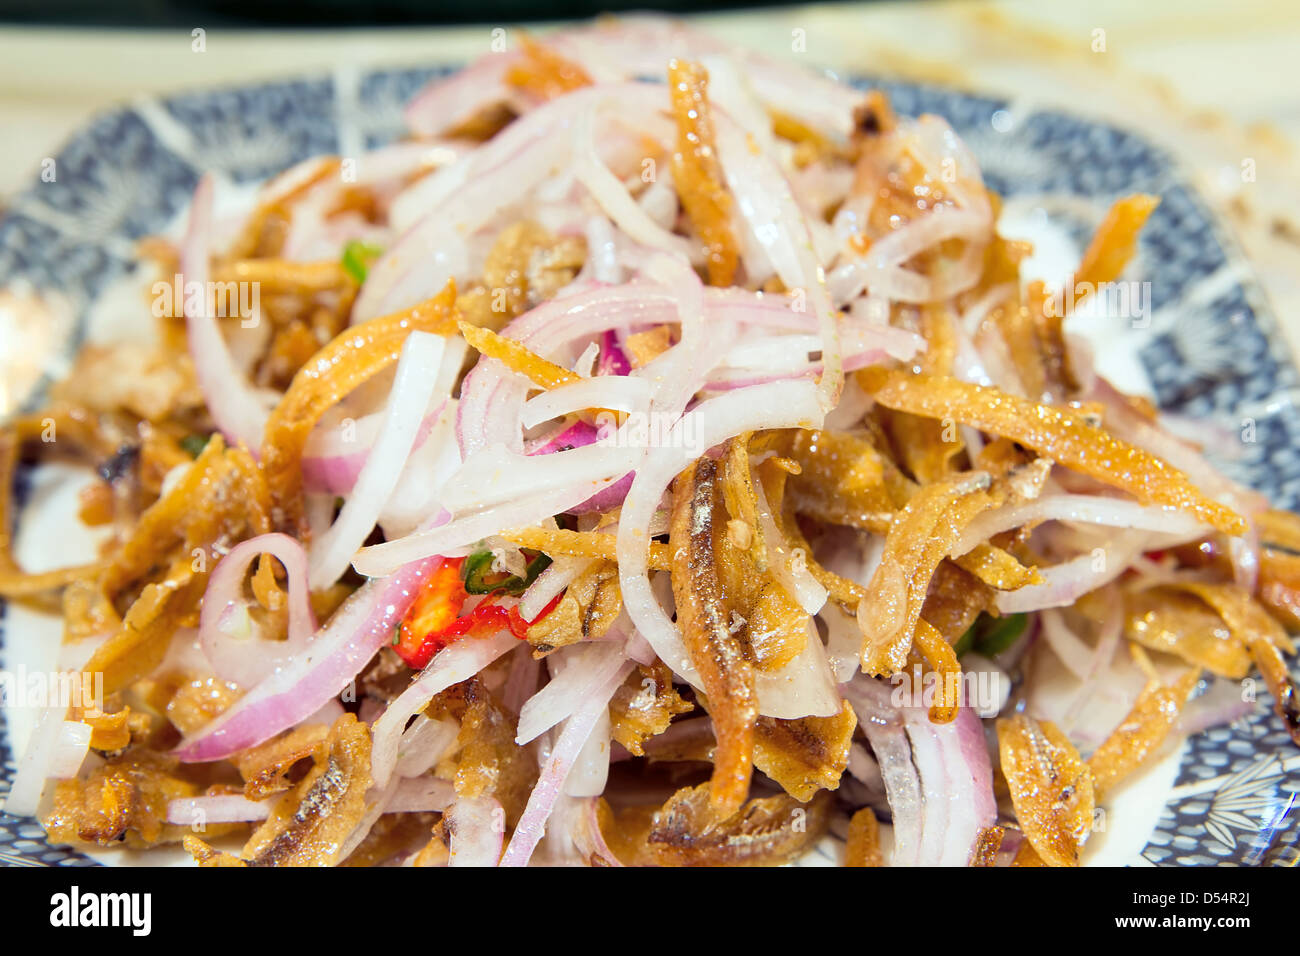 Nonya Peranakan Anchovies with Red Onions and Chili Dish Closeup - Stock Image